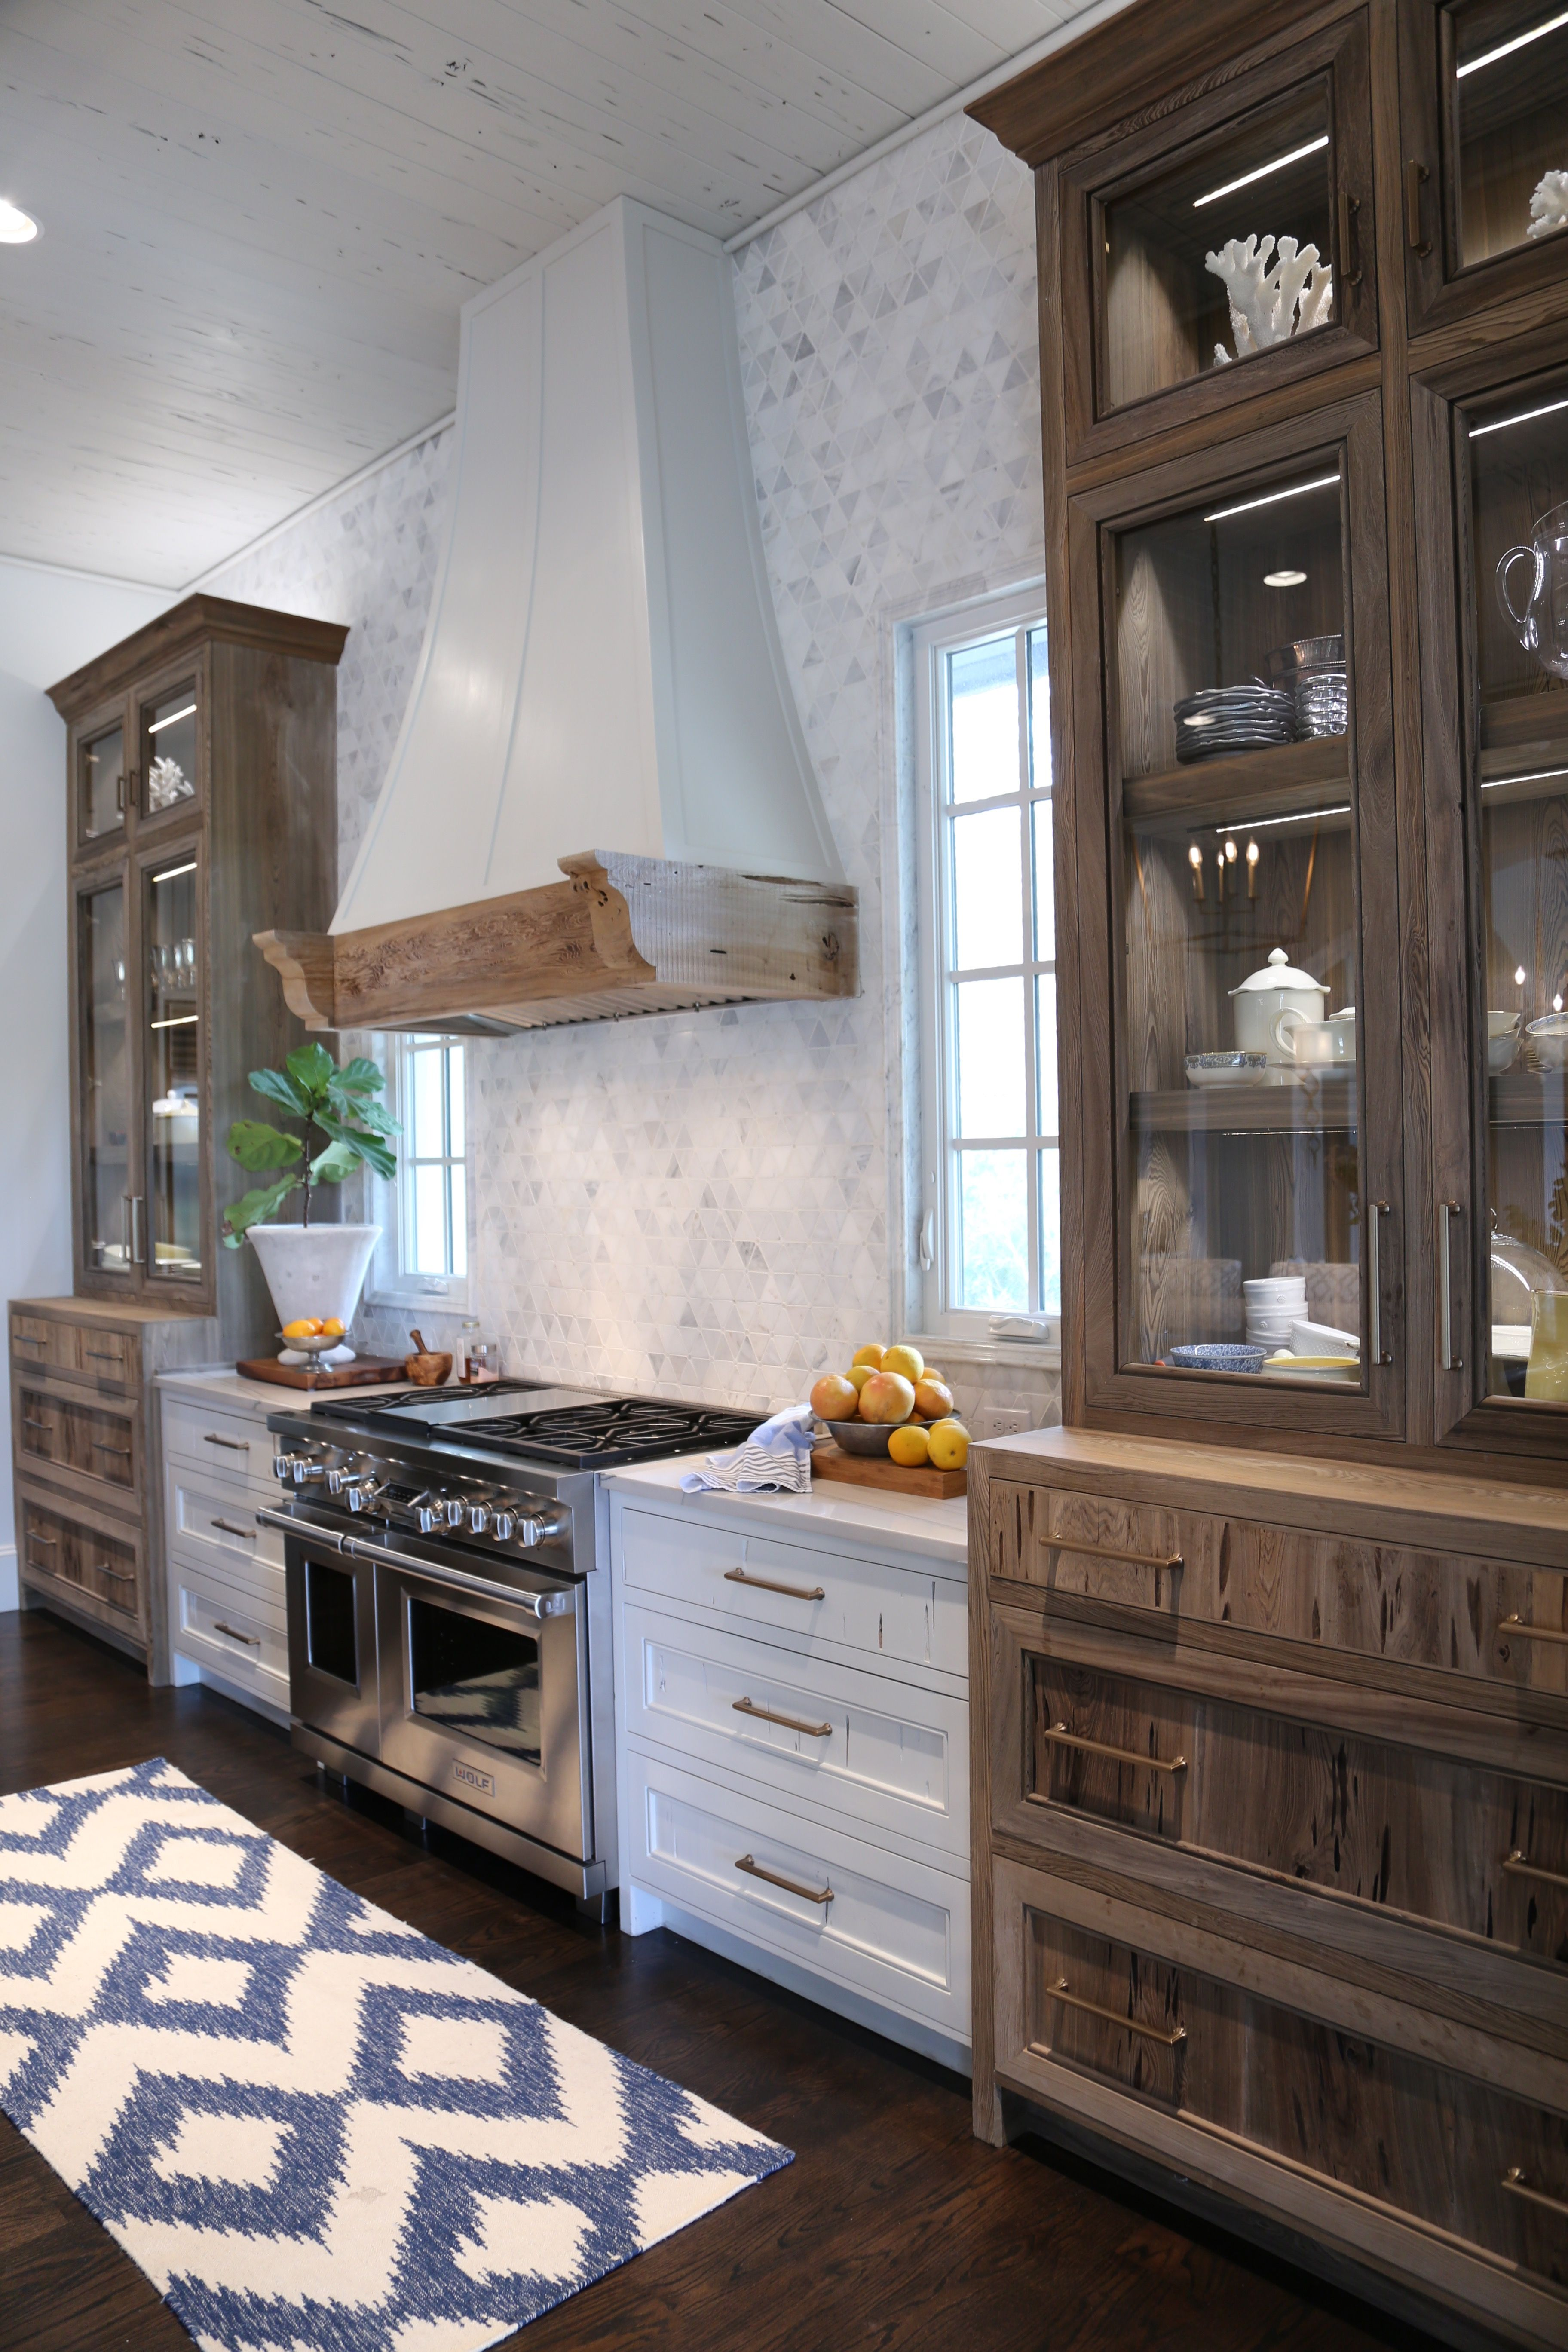 Hood with wood trim | Heavenly Kitchen Hoods | Pinterest | Seemann ...